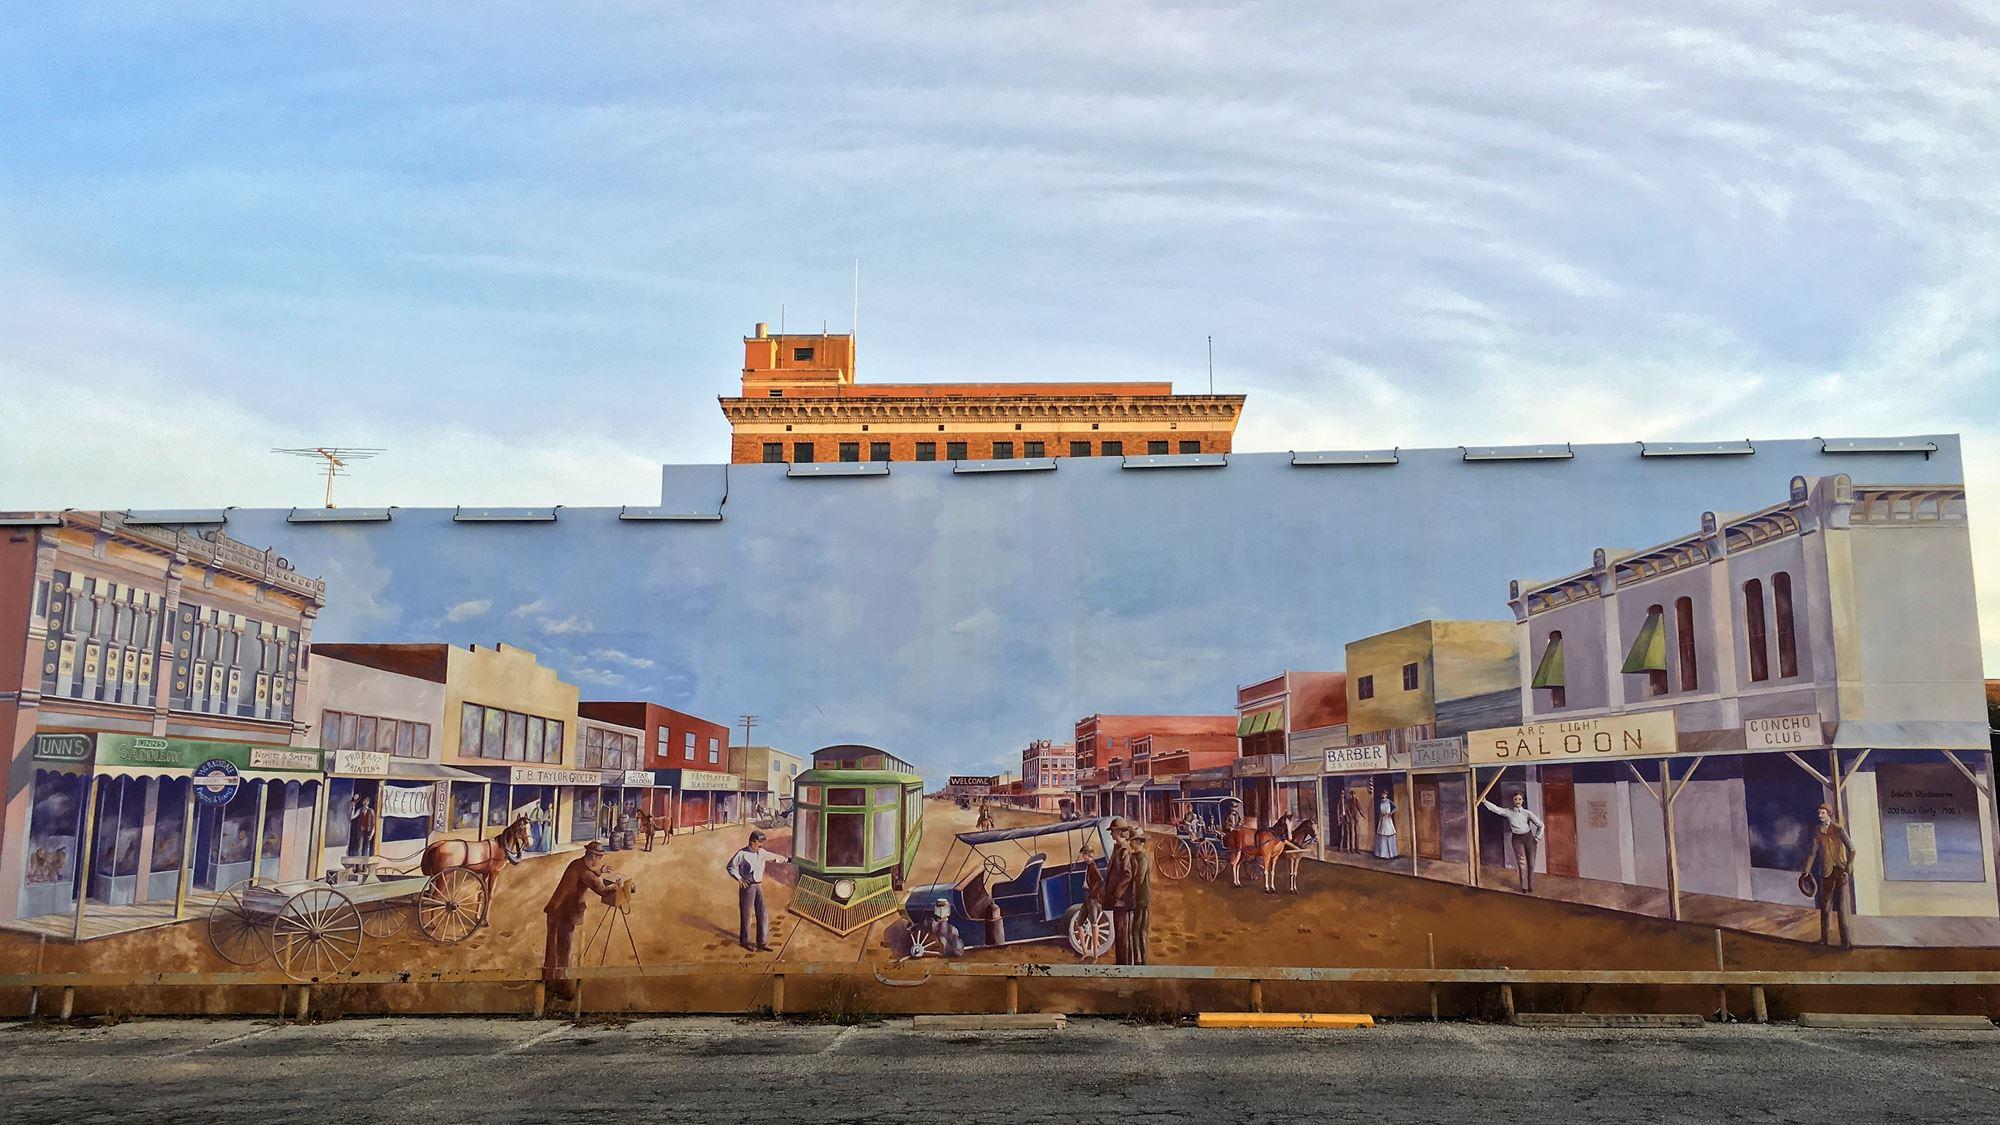 The Chadbourne Street Mural